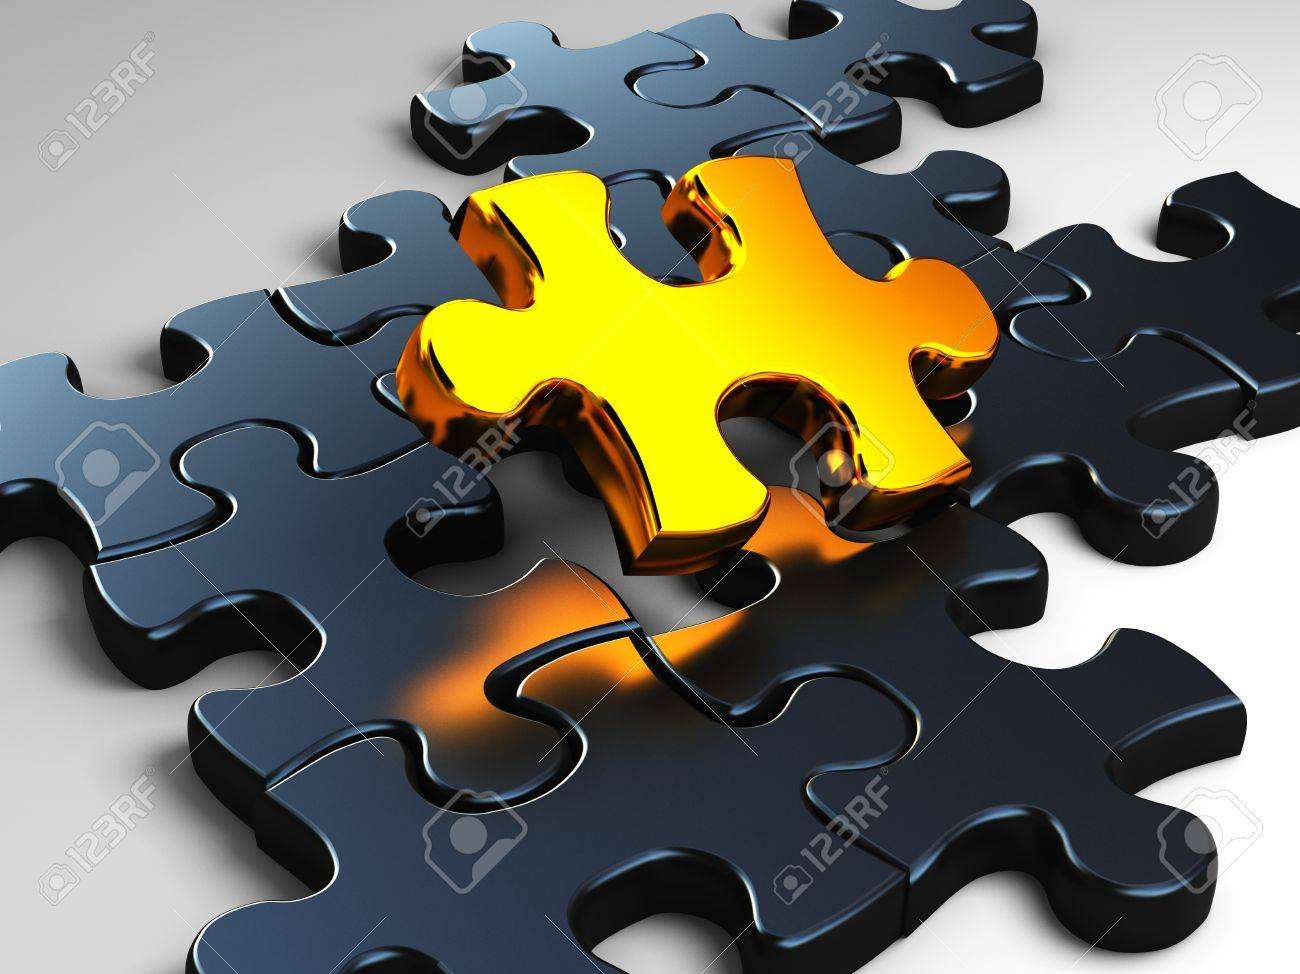 fine 3d image of golden piece of jigsaw Stock Photo - 9359561